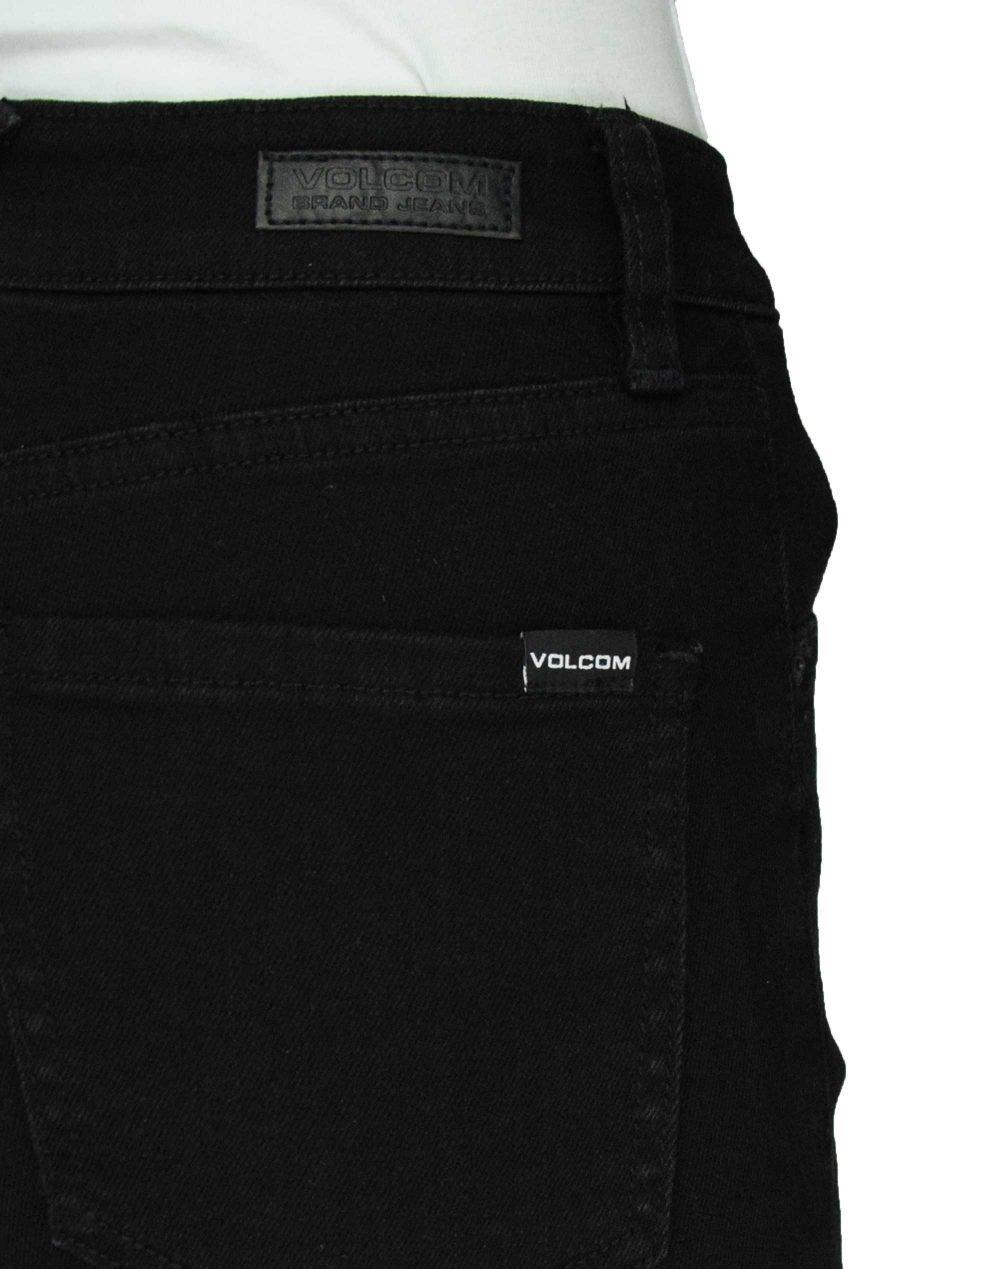 Volcom Liberator High Rise (B1931900 PBK) Premium Wash Black